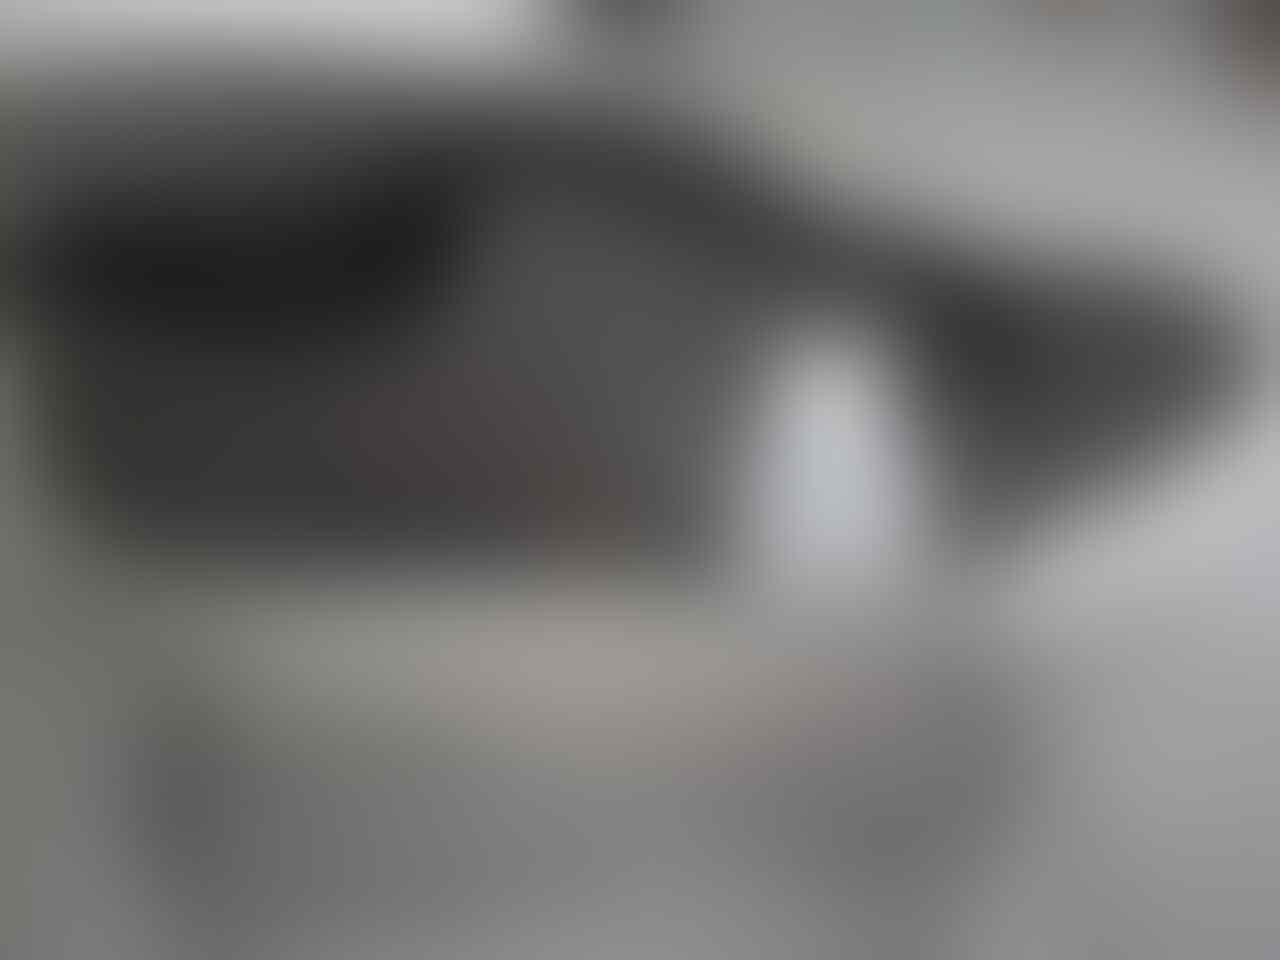 [WTS] [JUAL] Sepatu Ori Macbeth - Matthew Dark Grey/Cement Cracked Leather